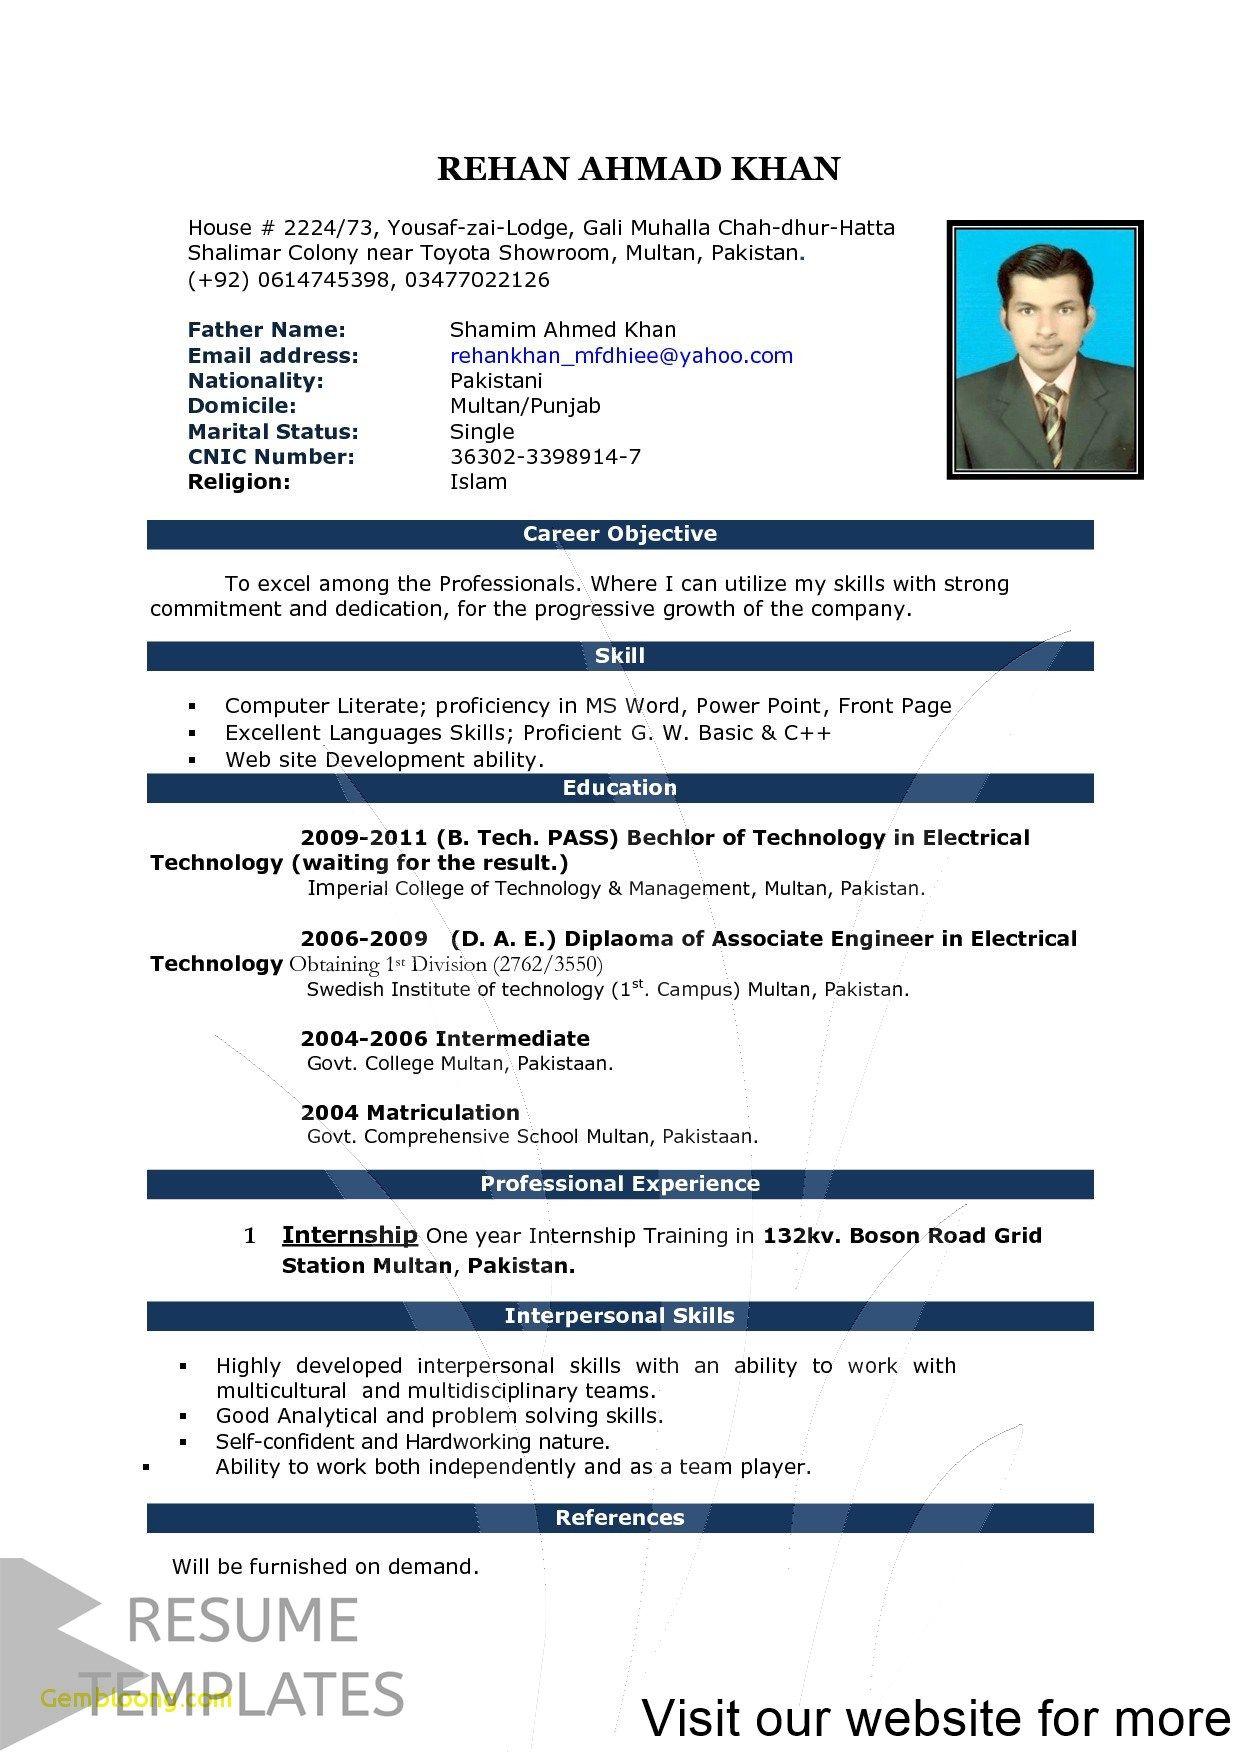 Resume Template Free Google Docs Microsoft Word Resume Template Cv Template Download Resume Format Download